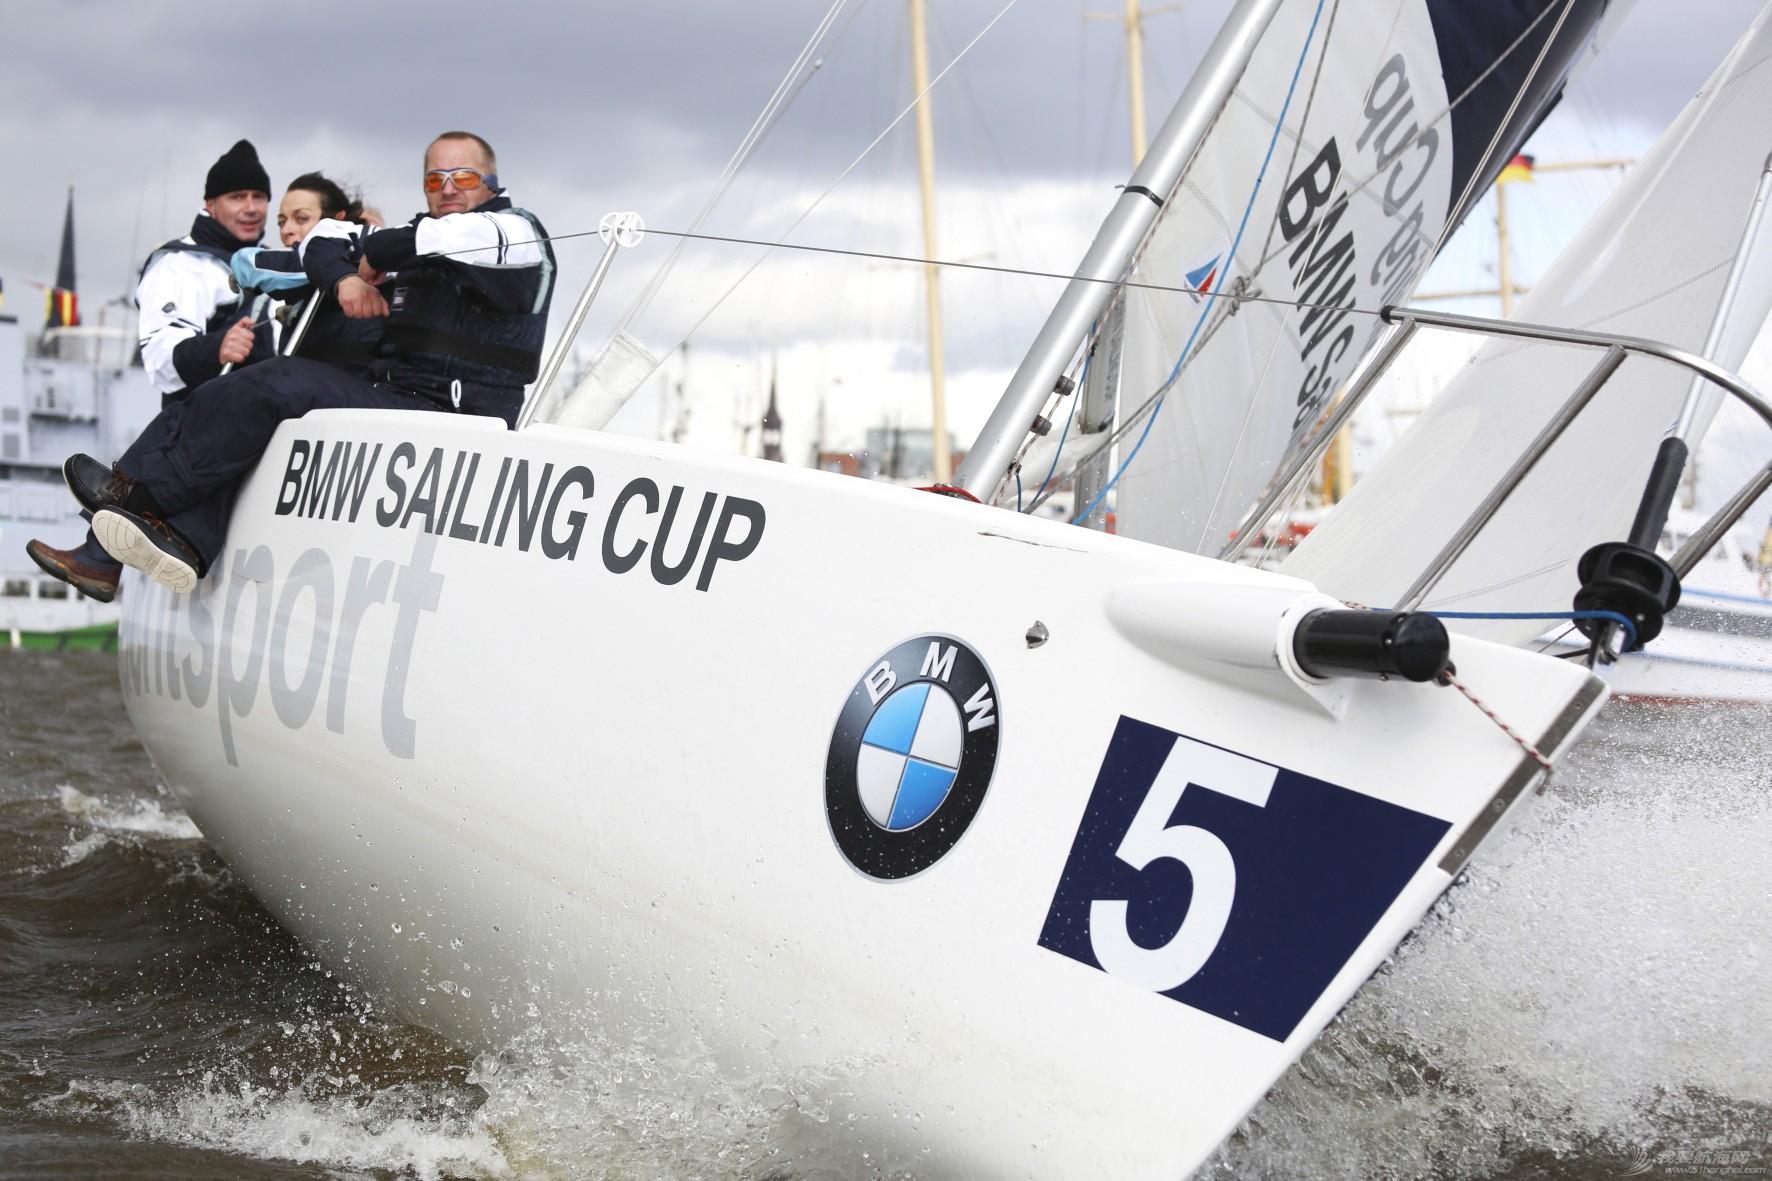 BMW-Sailing-Cup-2012-Hamburg_006.jpg